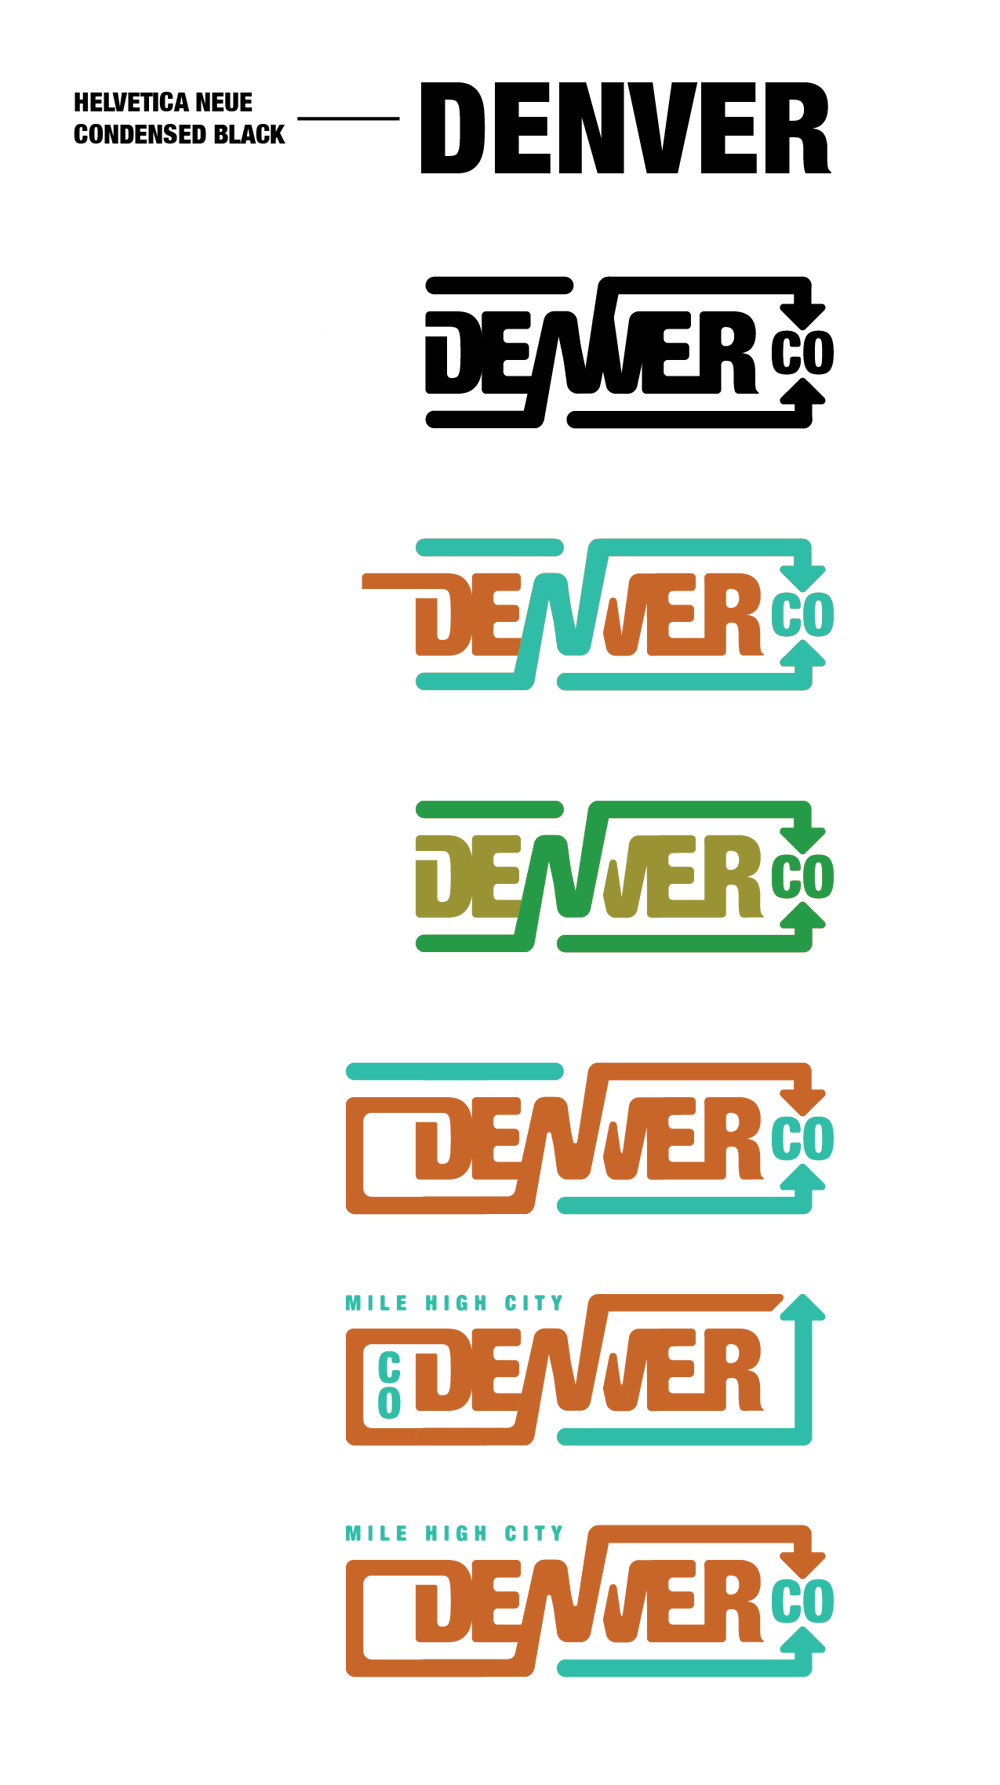 Definitely Denver - image 1 - student project